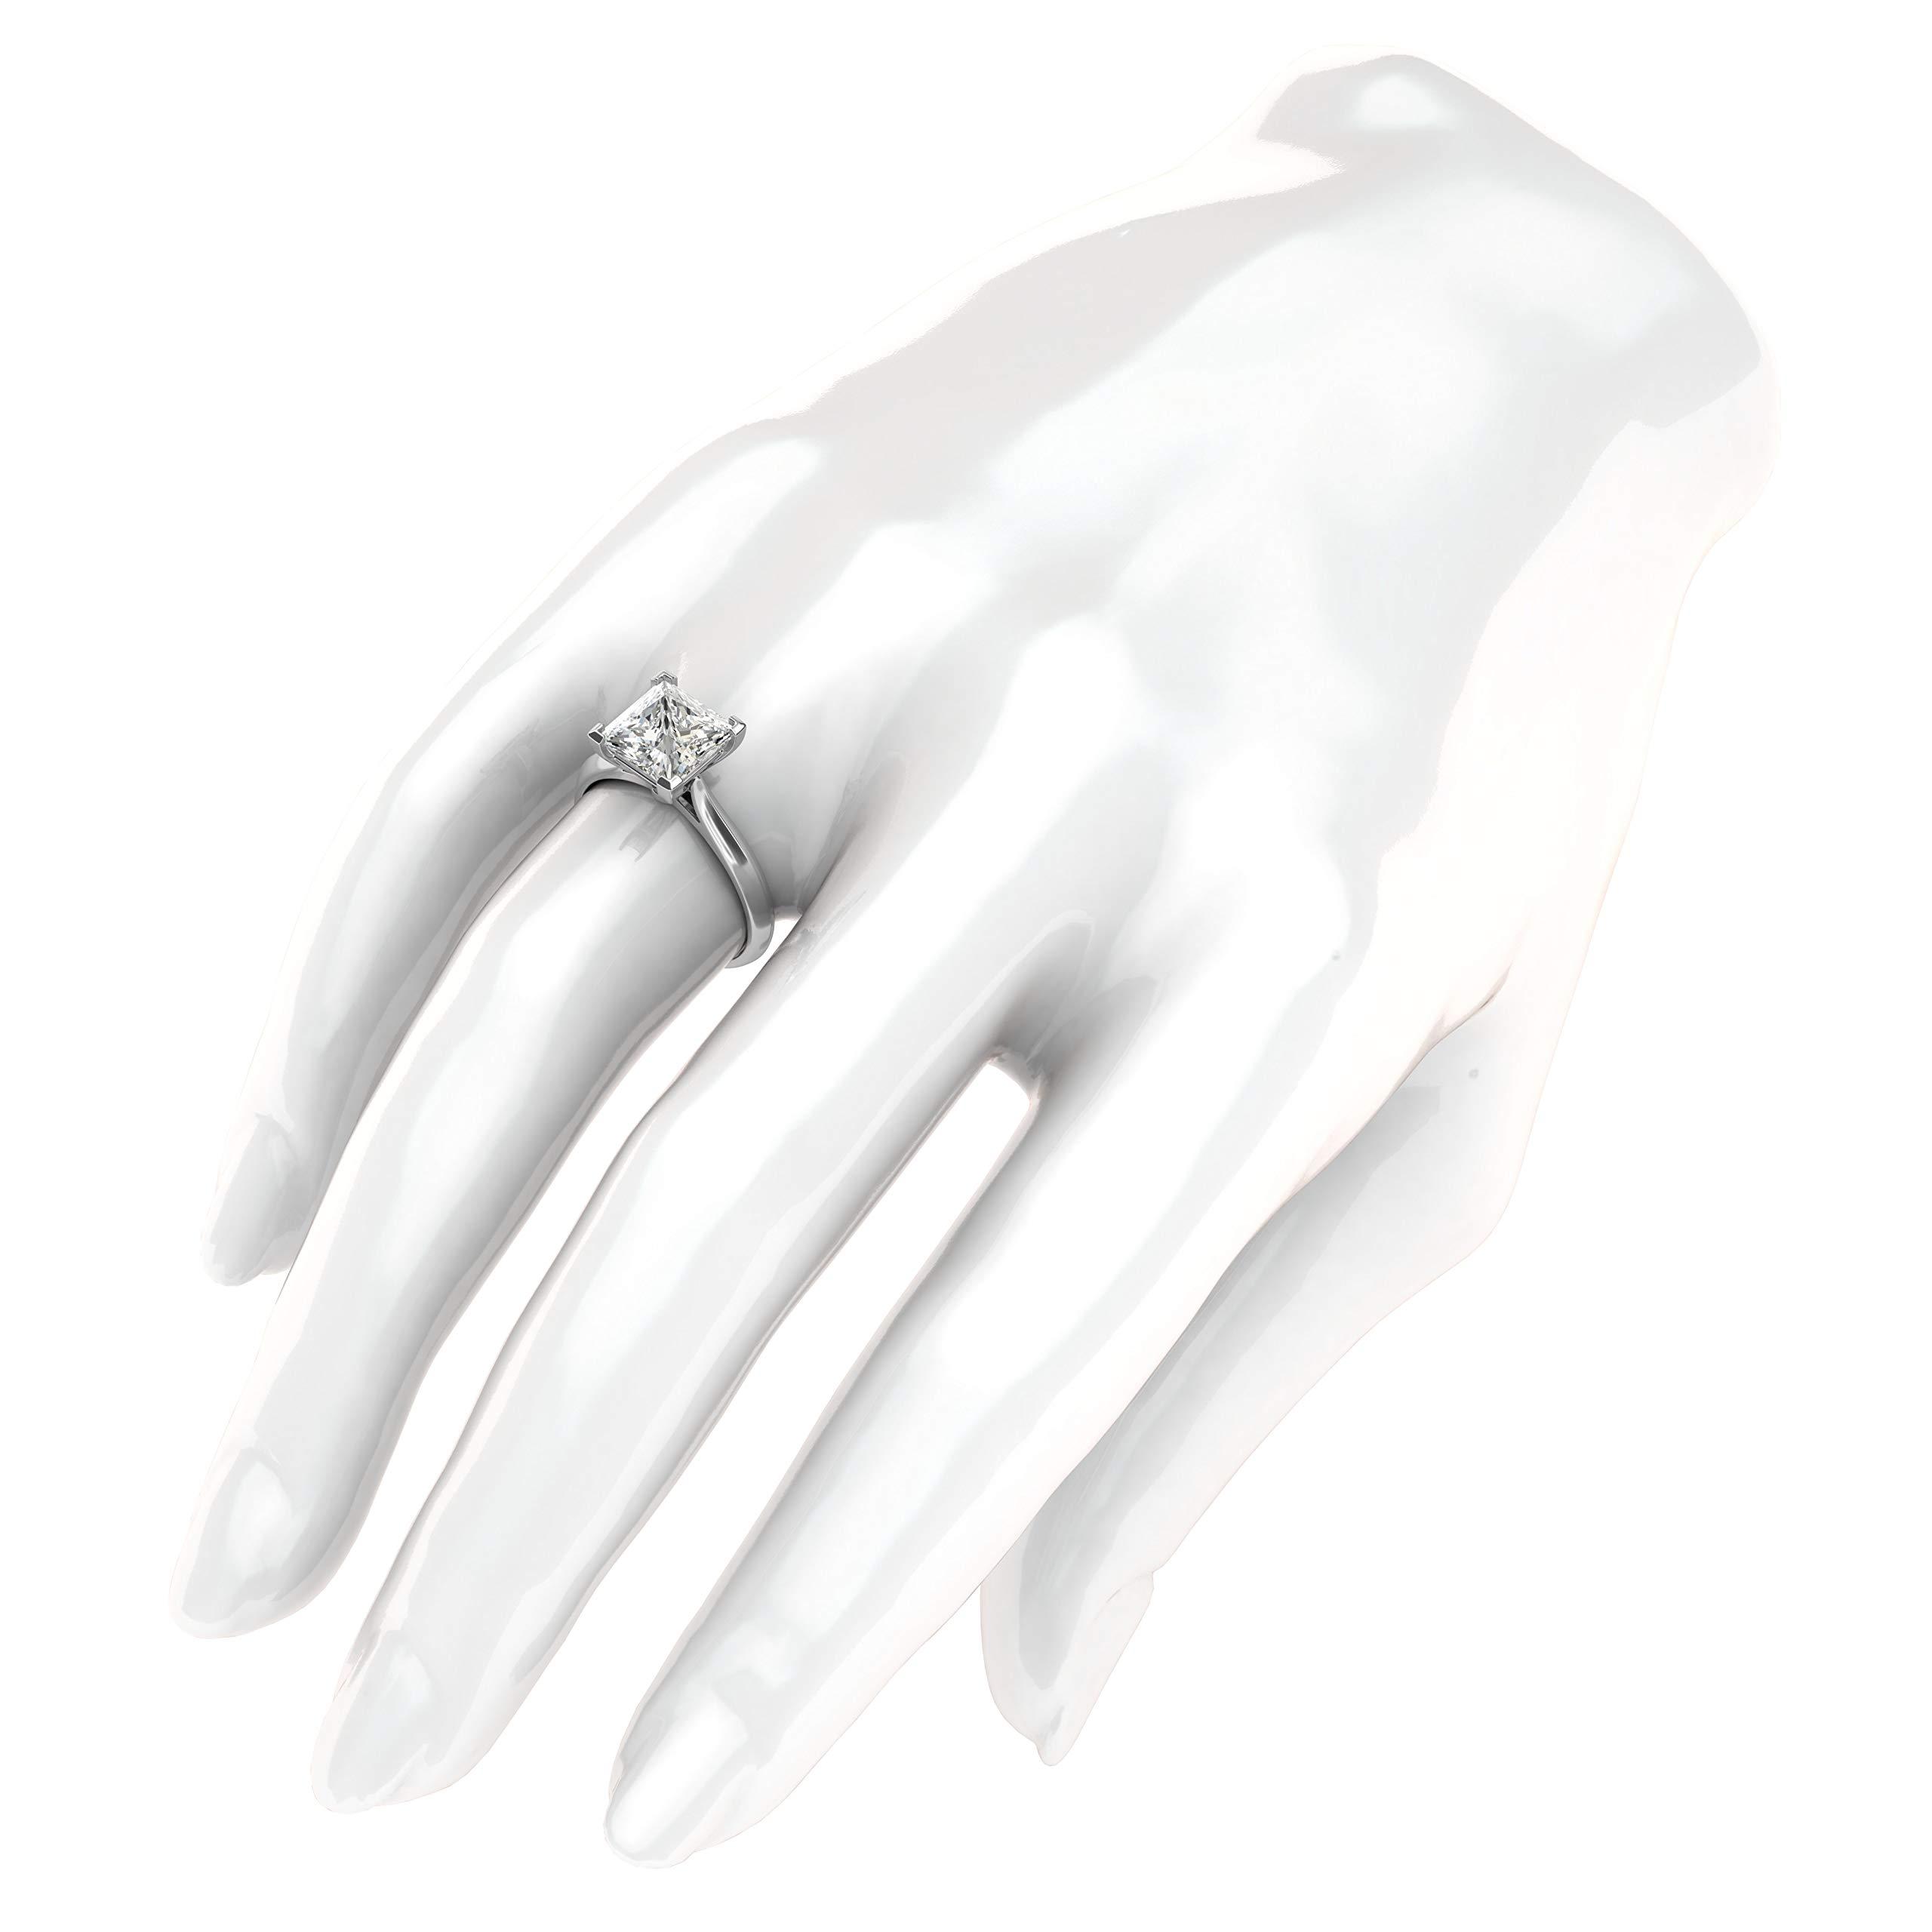 14k White Gold Square 8mm Simulated Princess Cut Diamond Engagement Ring Knife Edge Promise Bridal Ring (8.5) by THELANDA (Image #4)